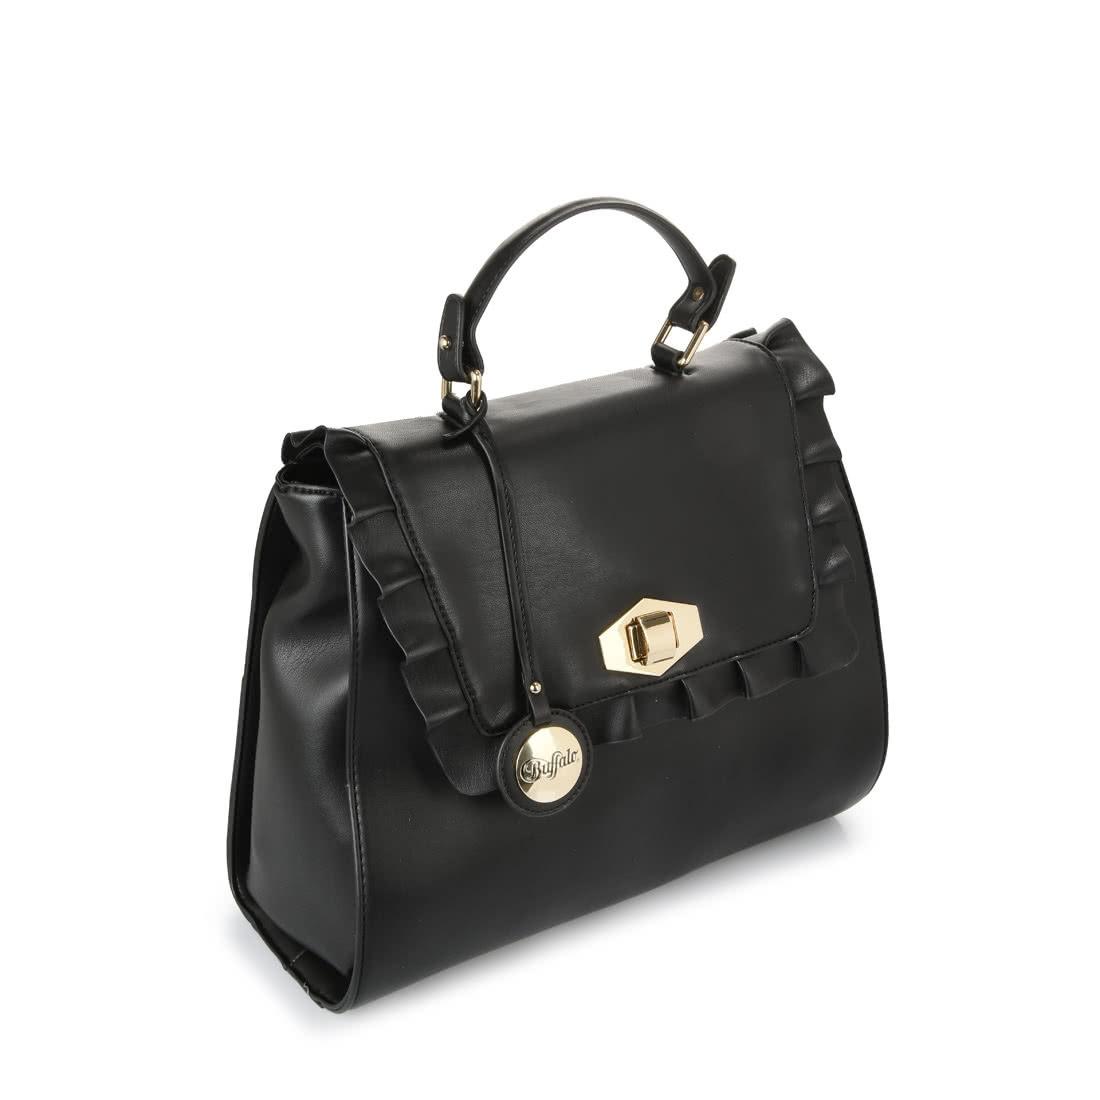 3cb245012b32 Buffalo black handbag with frills buy online in BUFFALO Online-Shop ...